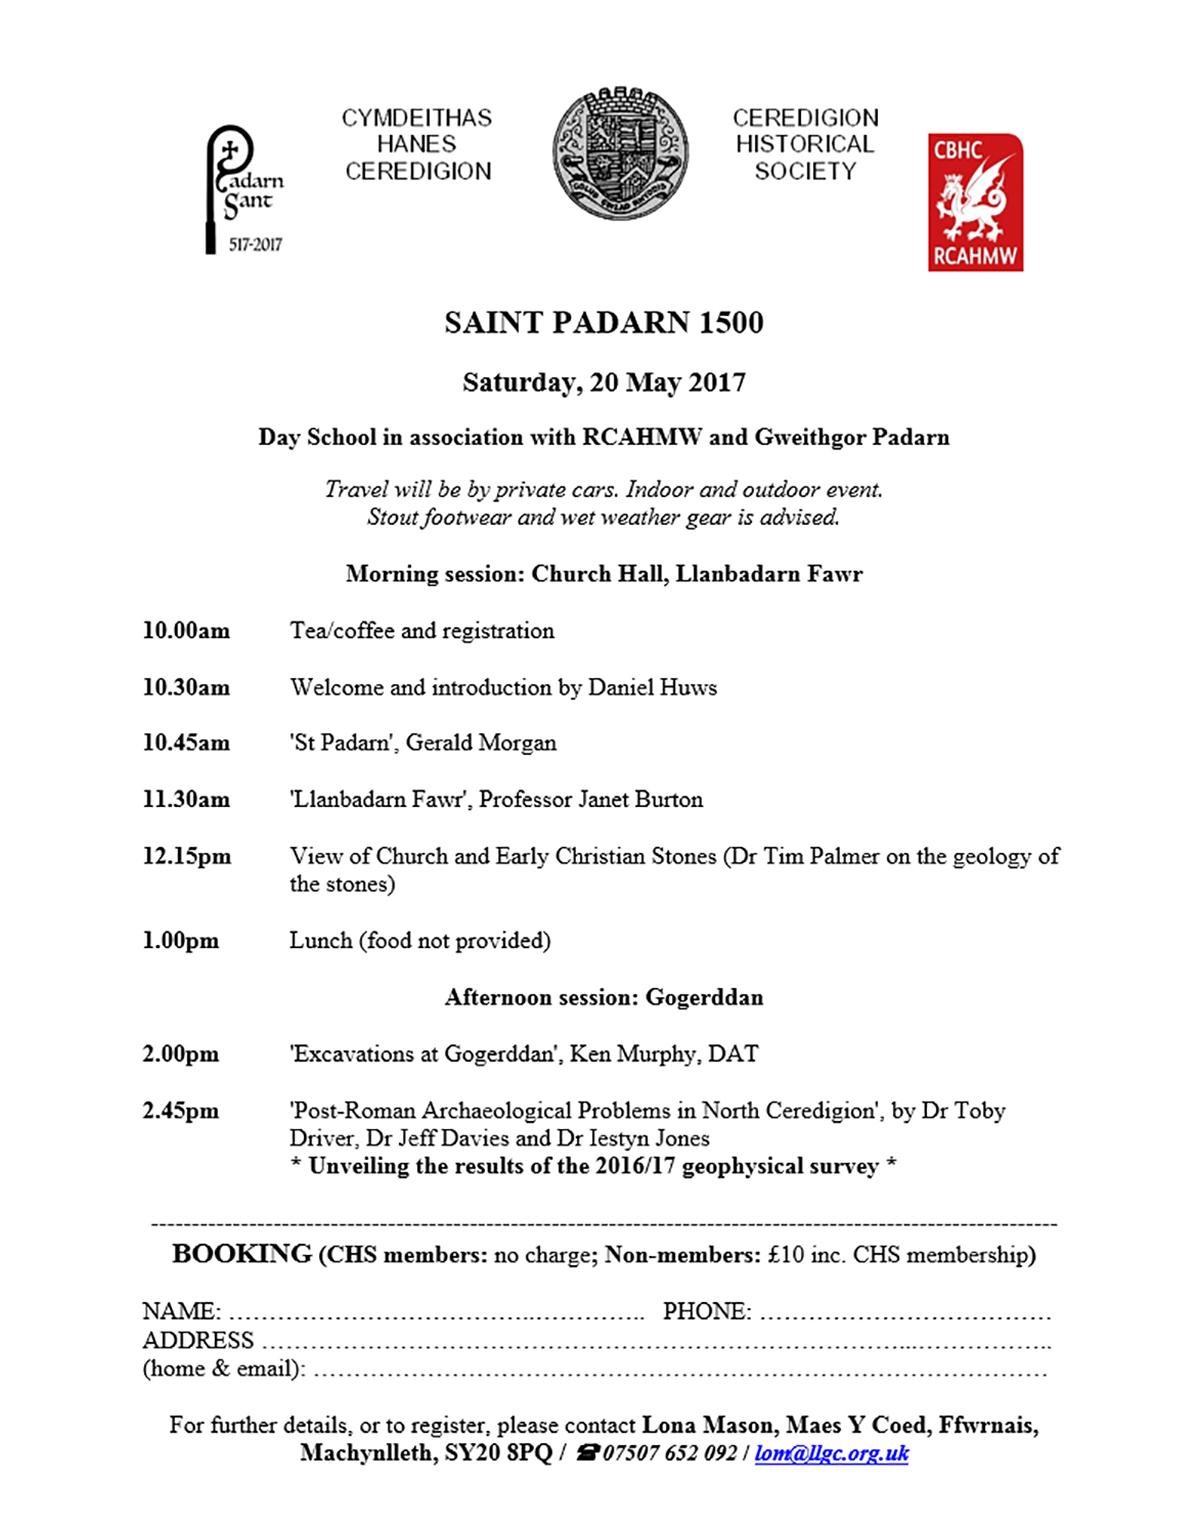 Saint Padarn 1500, Day School in association with RCAHMW and Gweithgor Padarn